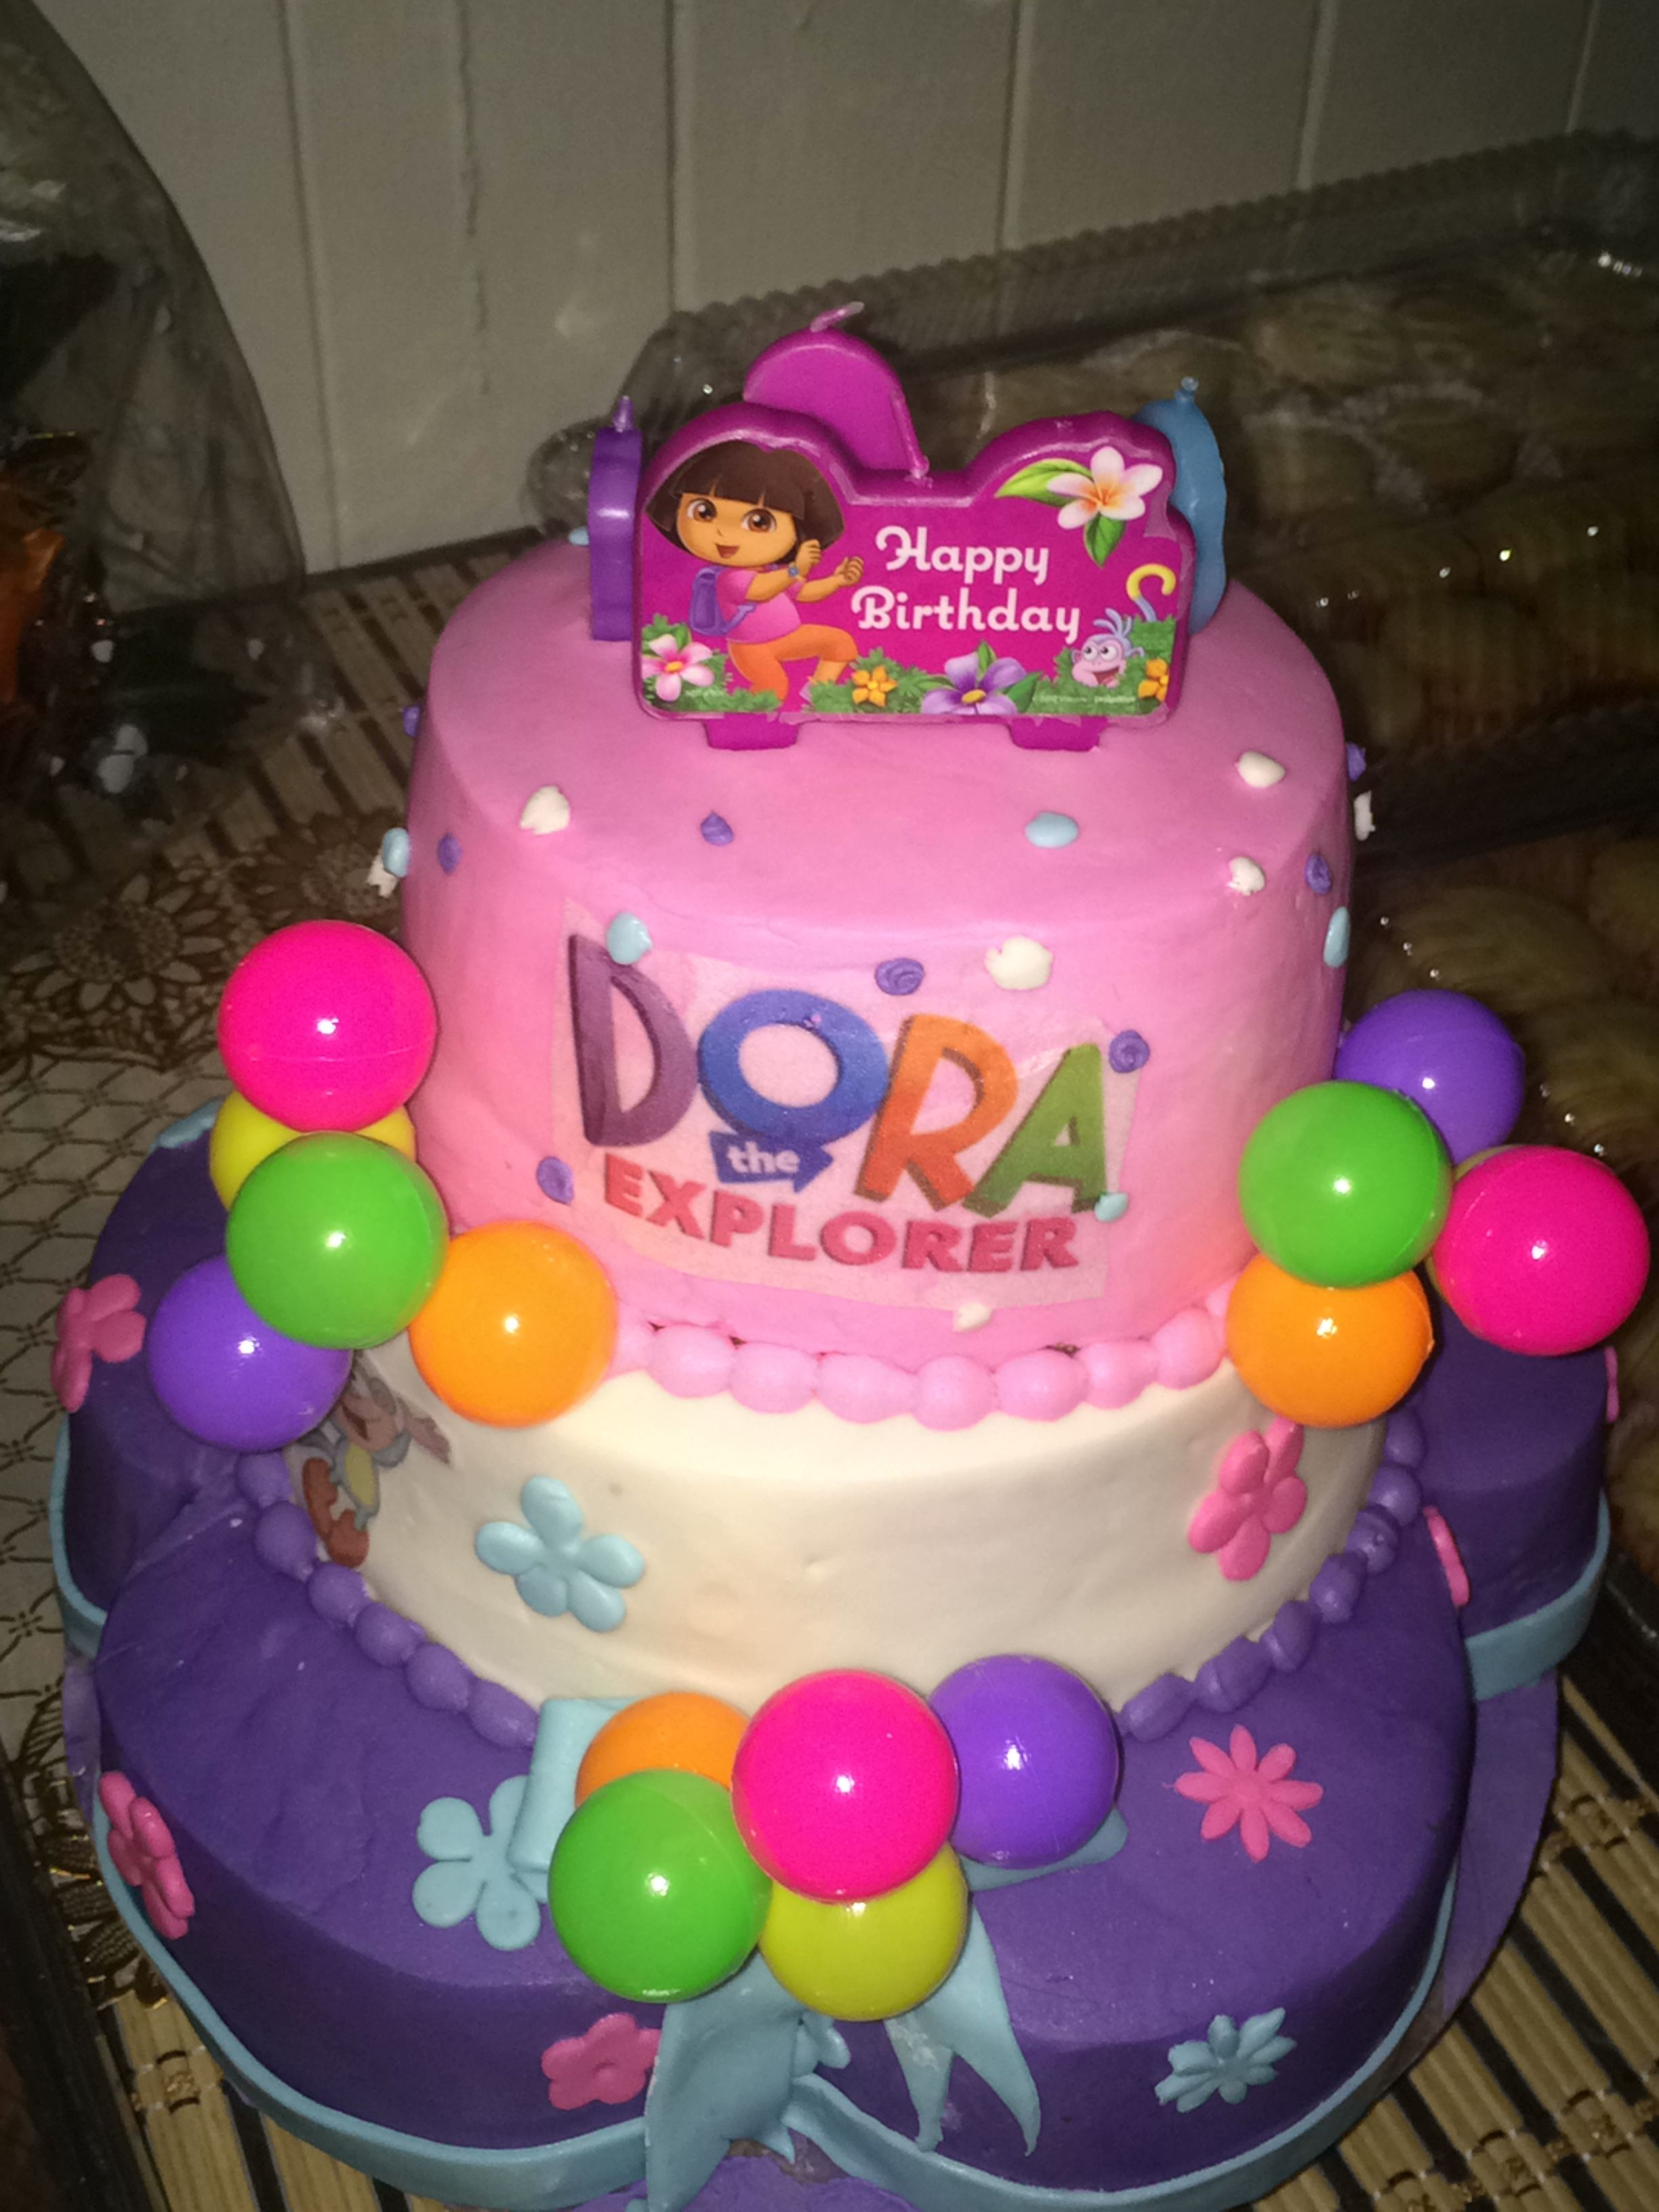 Tremendous Fun Dora Cake Colors Girl Happy Birthday With Images Birthday Cards Printable Benkemecafe Filternl